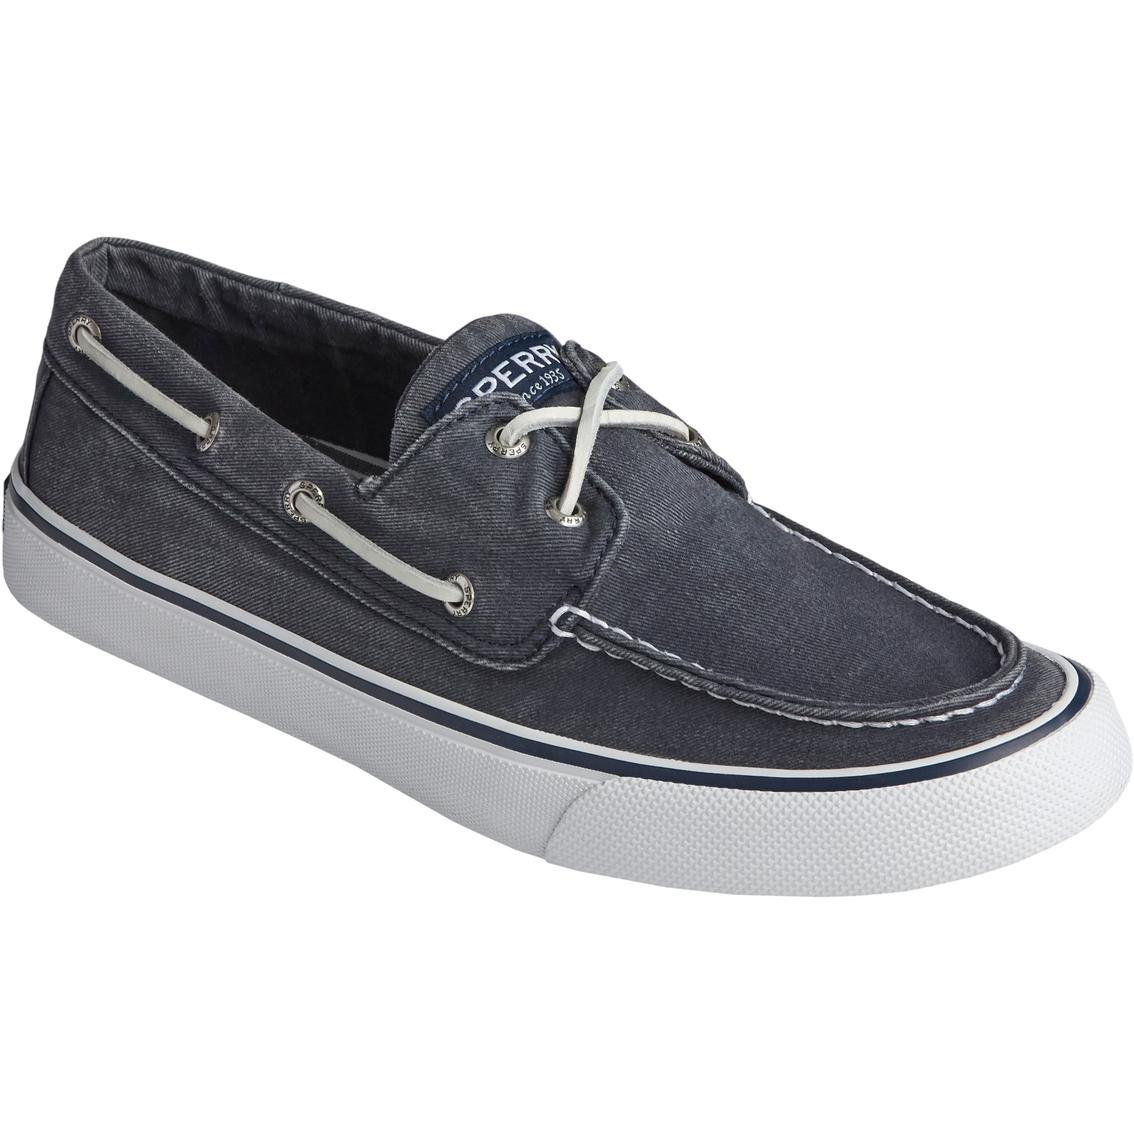 Sperry Men's Bahama Ii Boat Sneakers